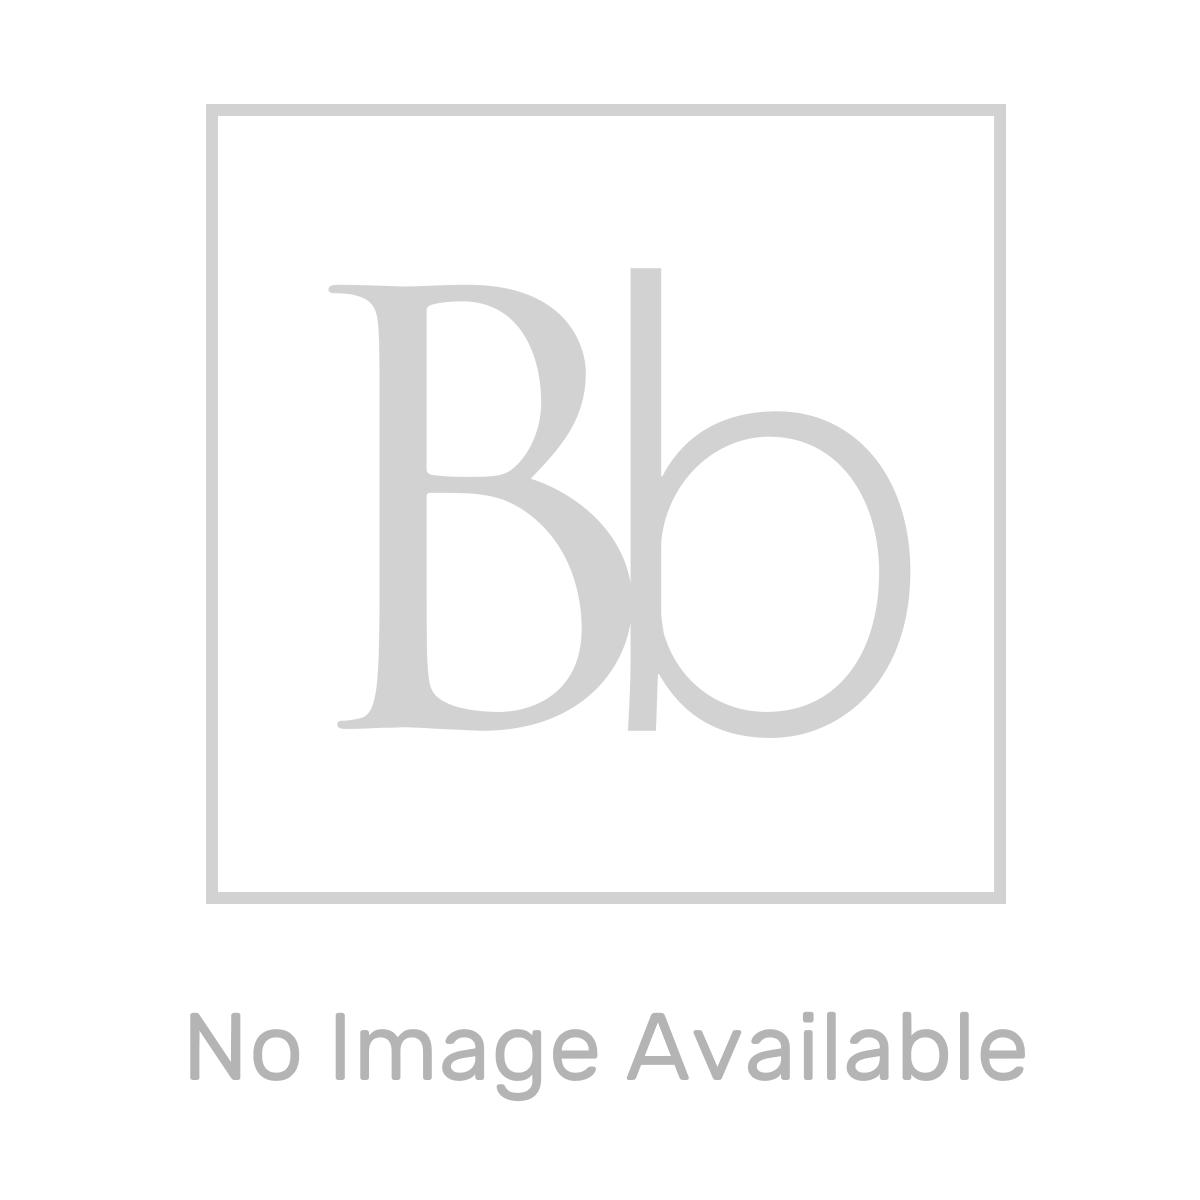 Frontline Aquaglass Purity Sliding Shower Door with Optional Side Panel